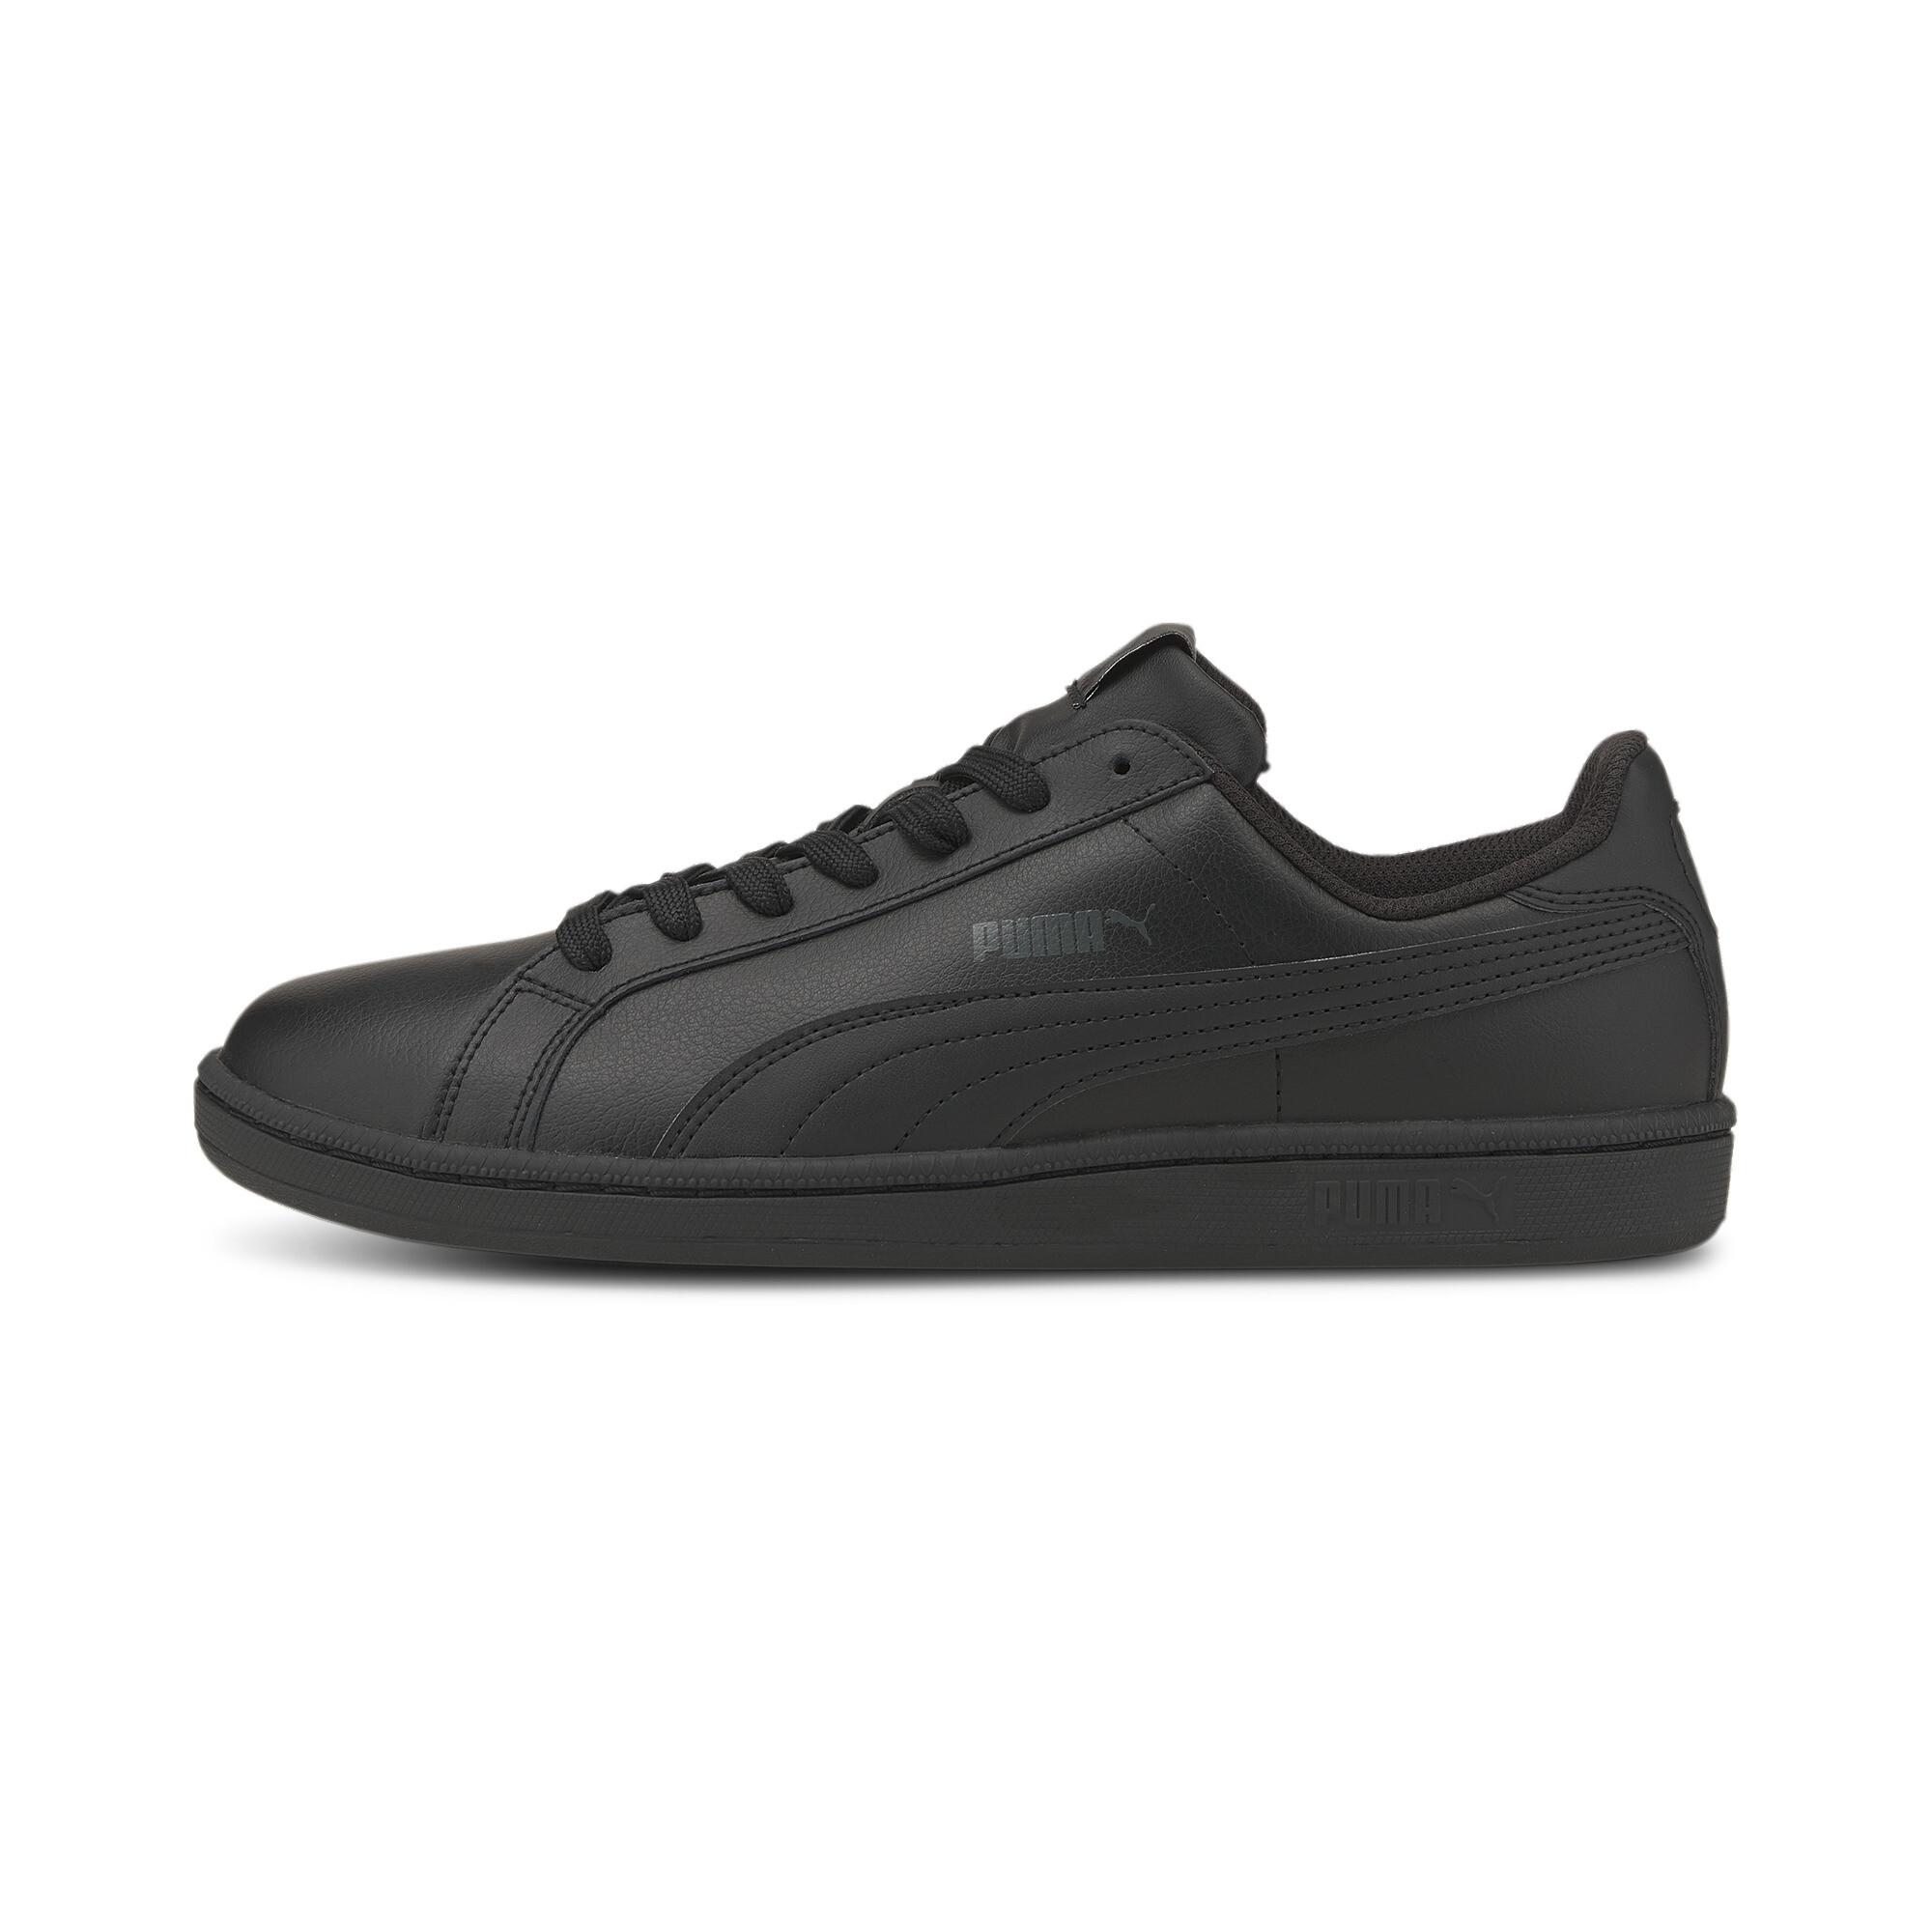 Indexbild 9 - PUMA Smash Trainers Schuhe Sneakers Sport Classics Unisex Neu